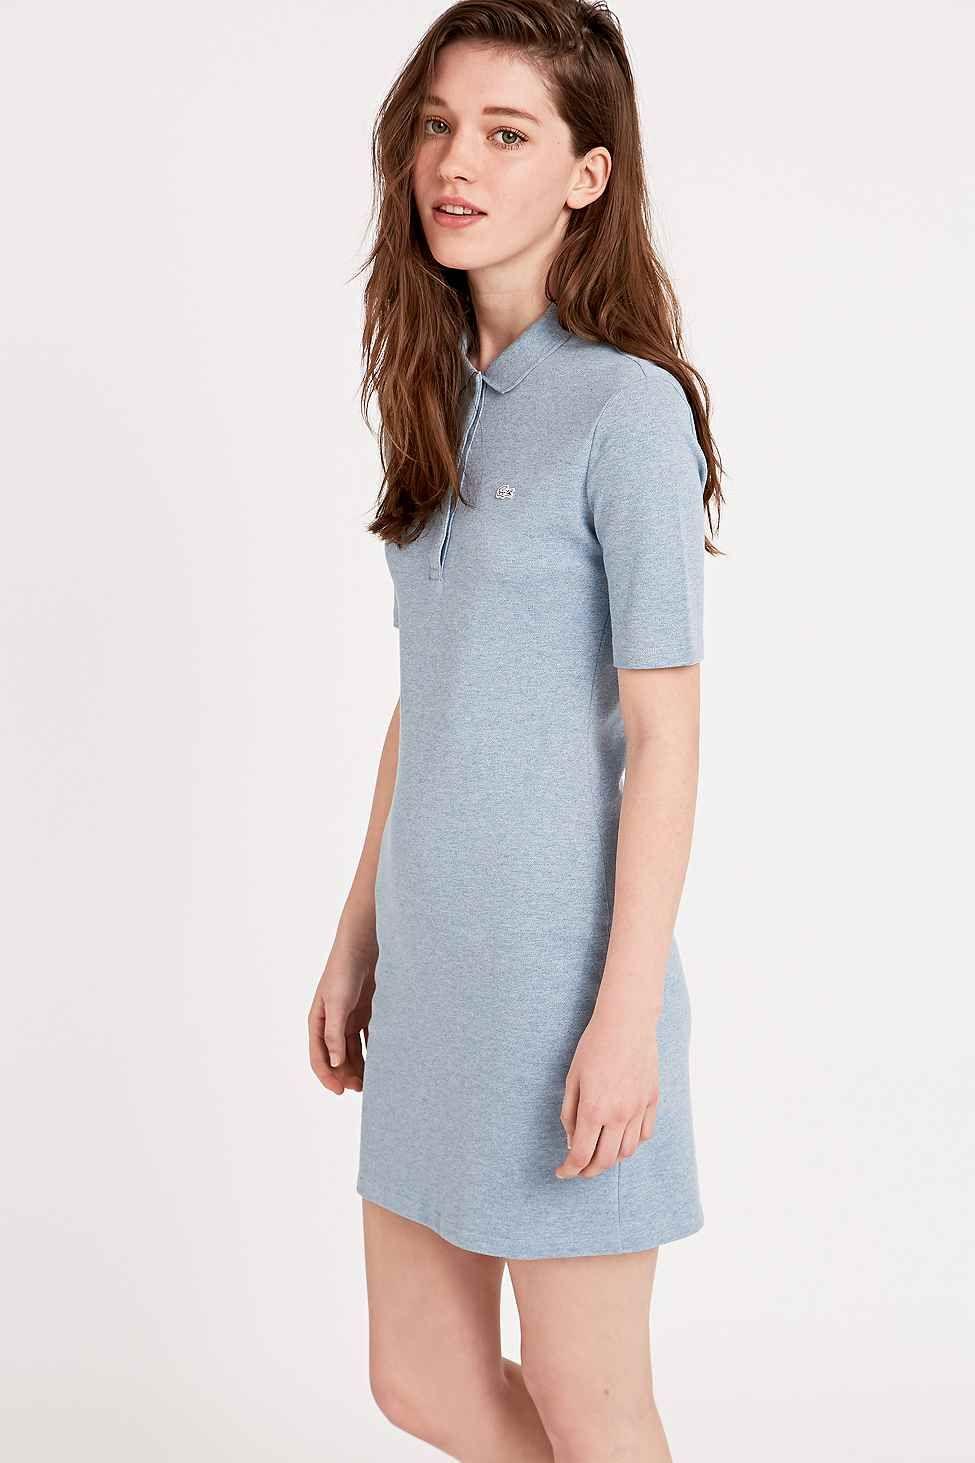 Sky Live Lacoste Polo Shirt In Dress BlueDresses Robe FKlTucJ135